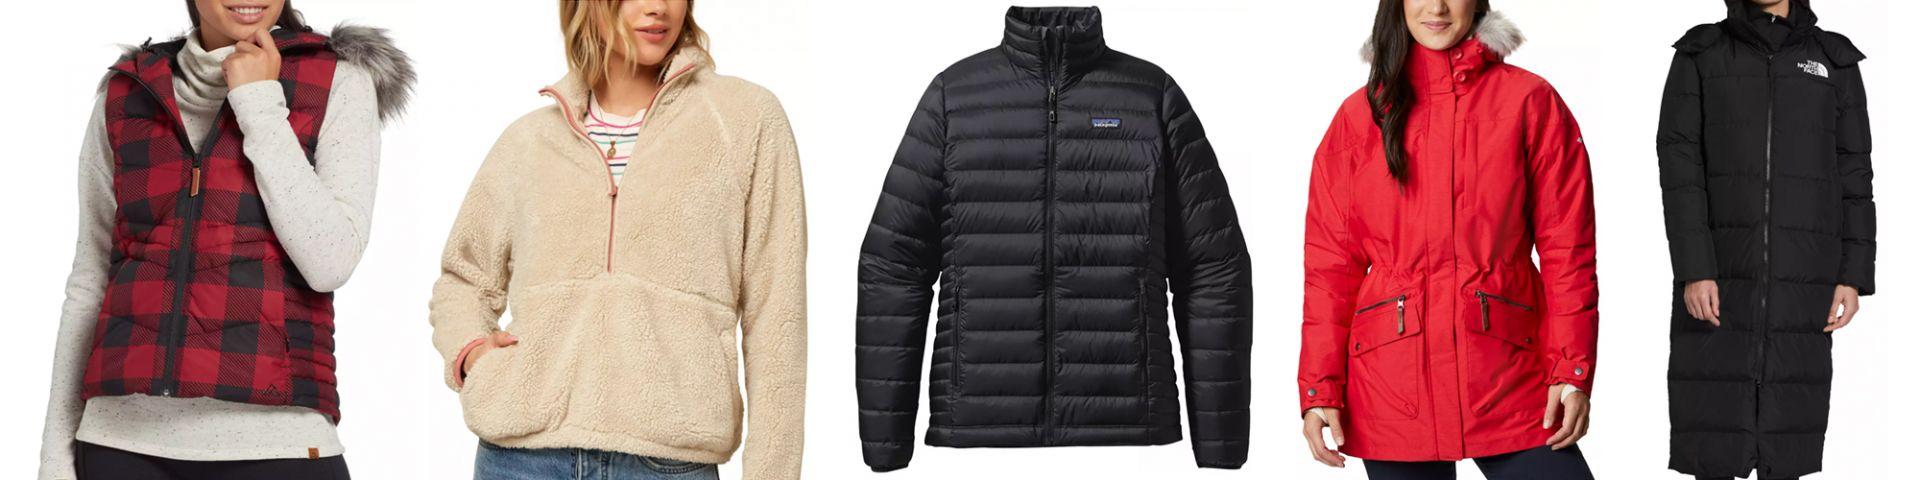 outerwear vest fleece pullover jacket down coat puffer